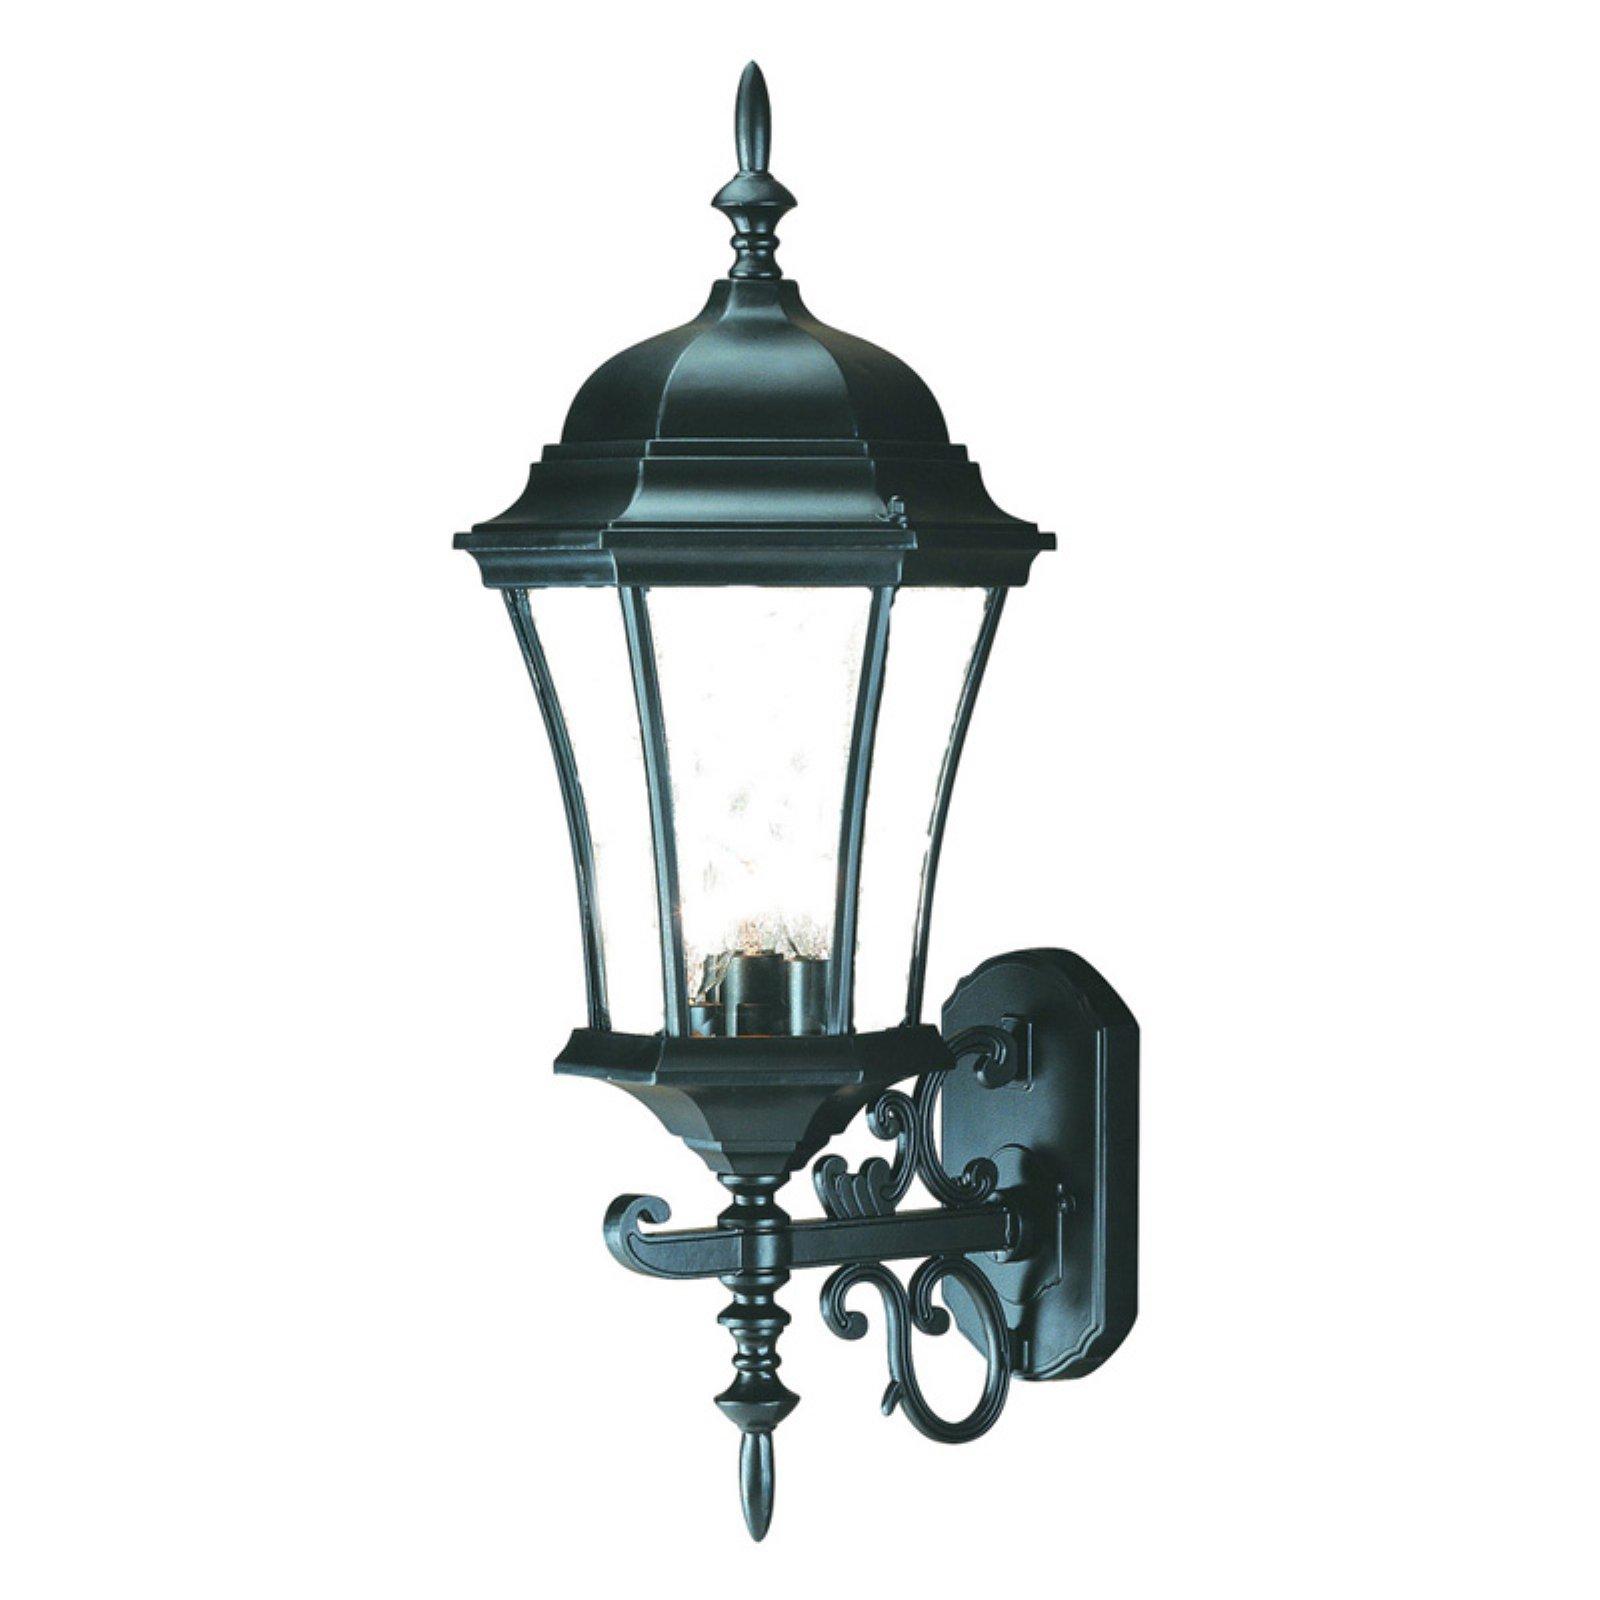 Acclaim Lighting Bryn Mawr 3 Light Outdoor Wall Mount Light Fixture